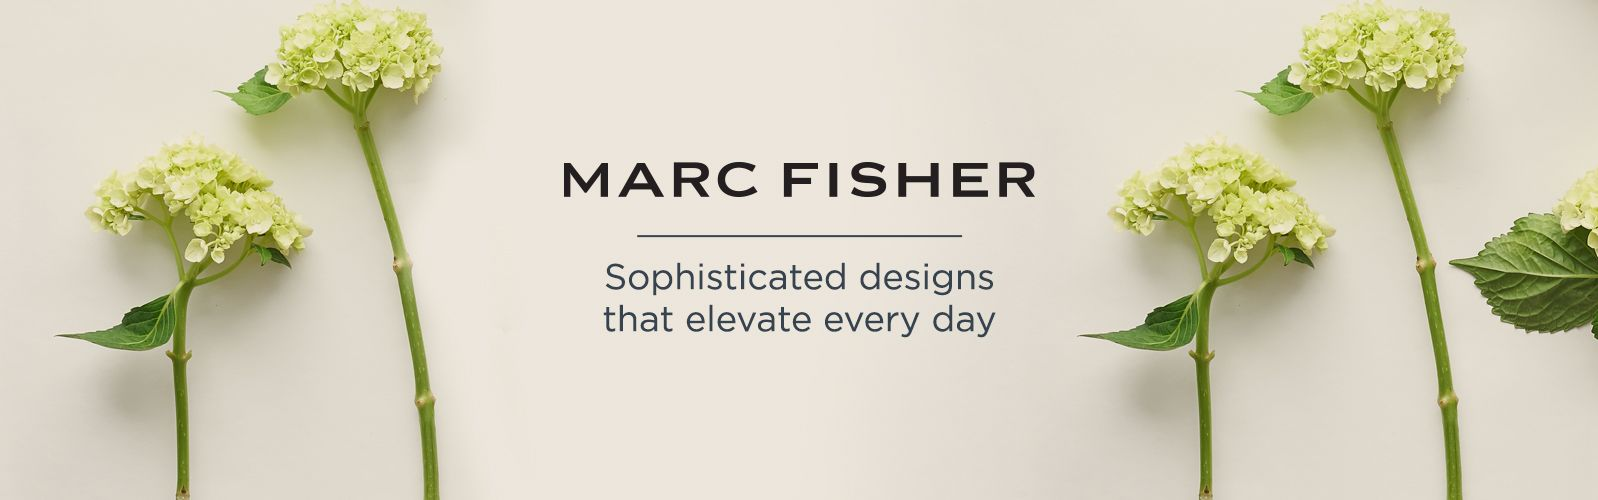 Marc Fisher — Boots, High Heels, Moccasins & More — QVC.com